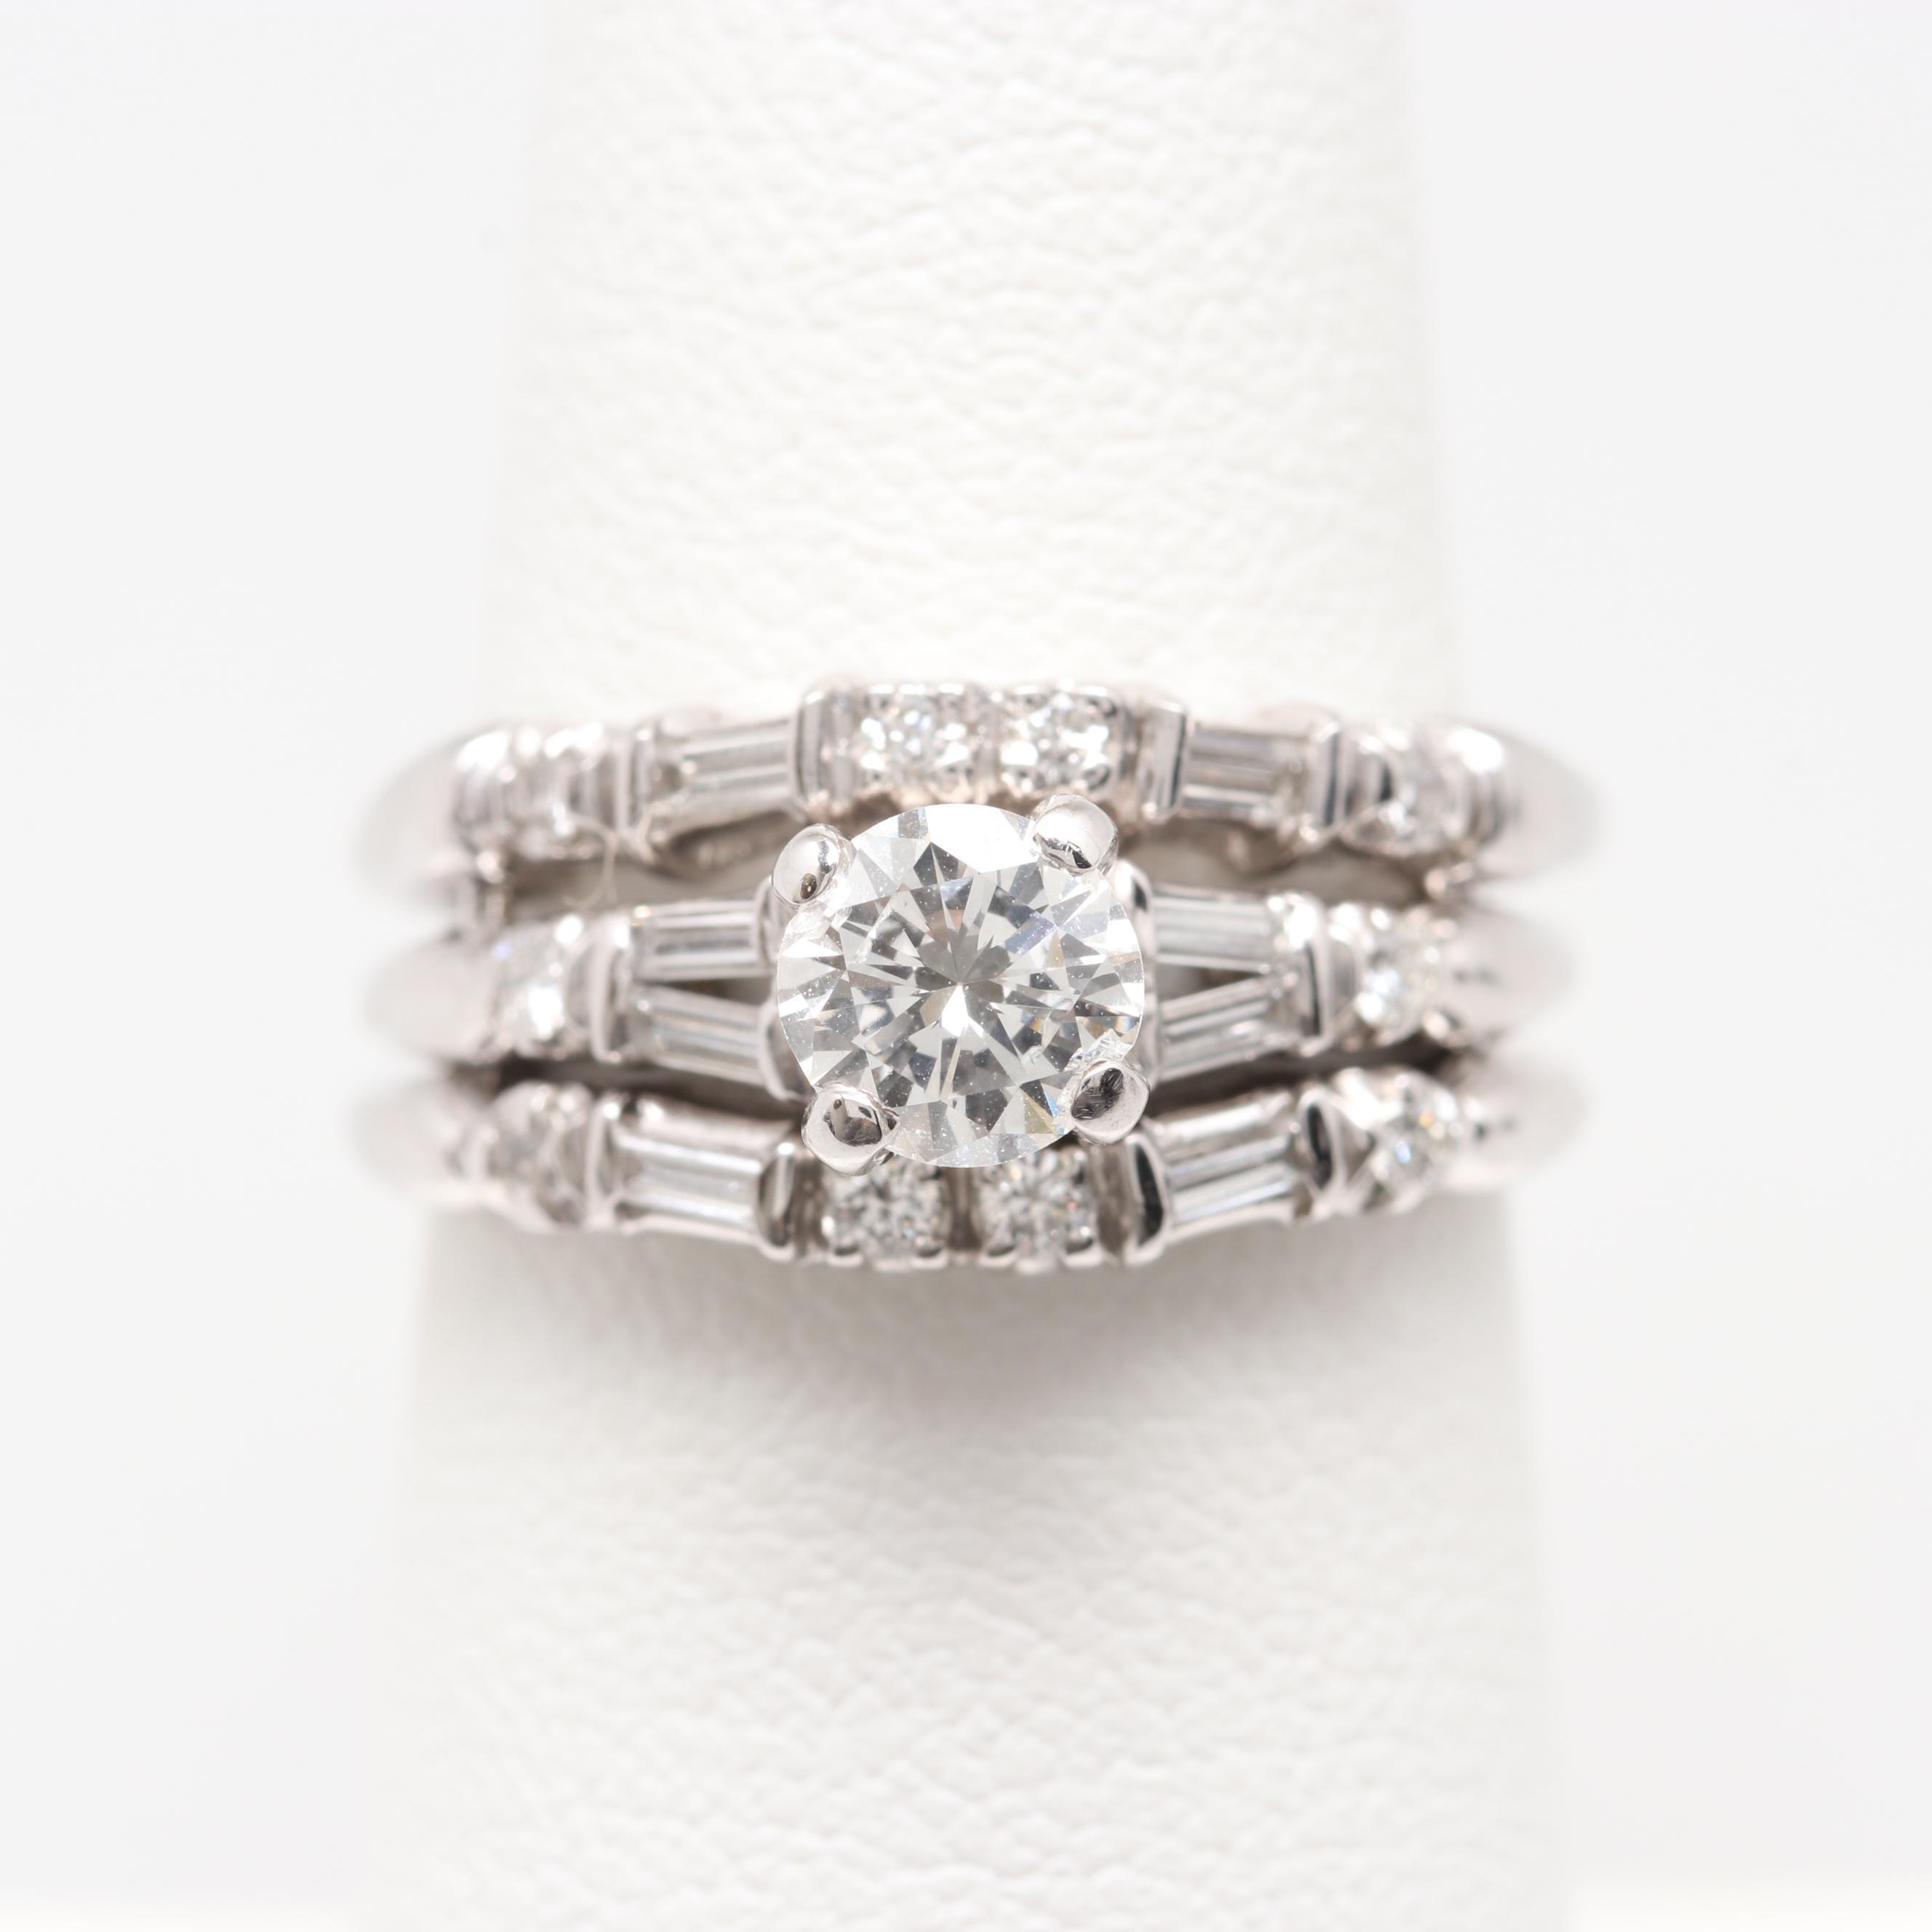 14K and 18K White Gold 1.08 CTW Diamond Wedding Ring Set